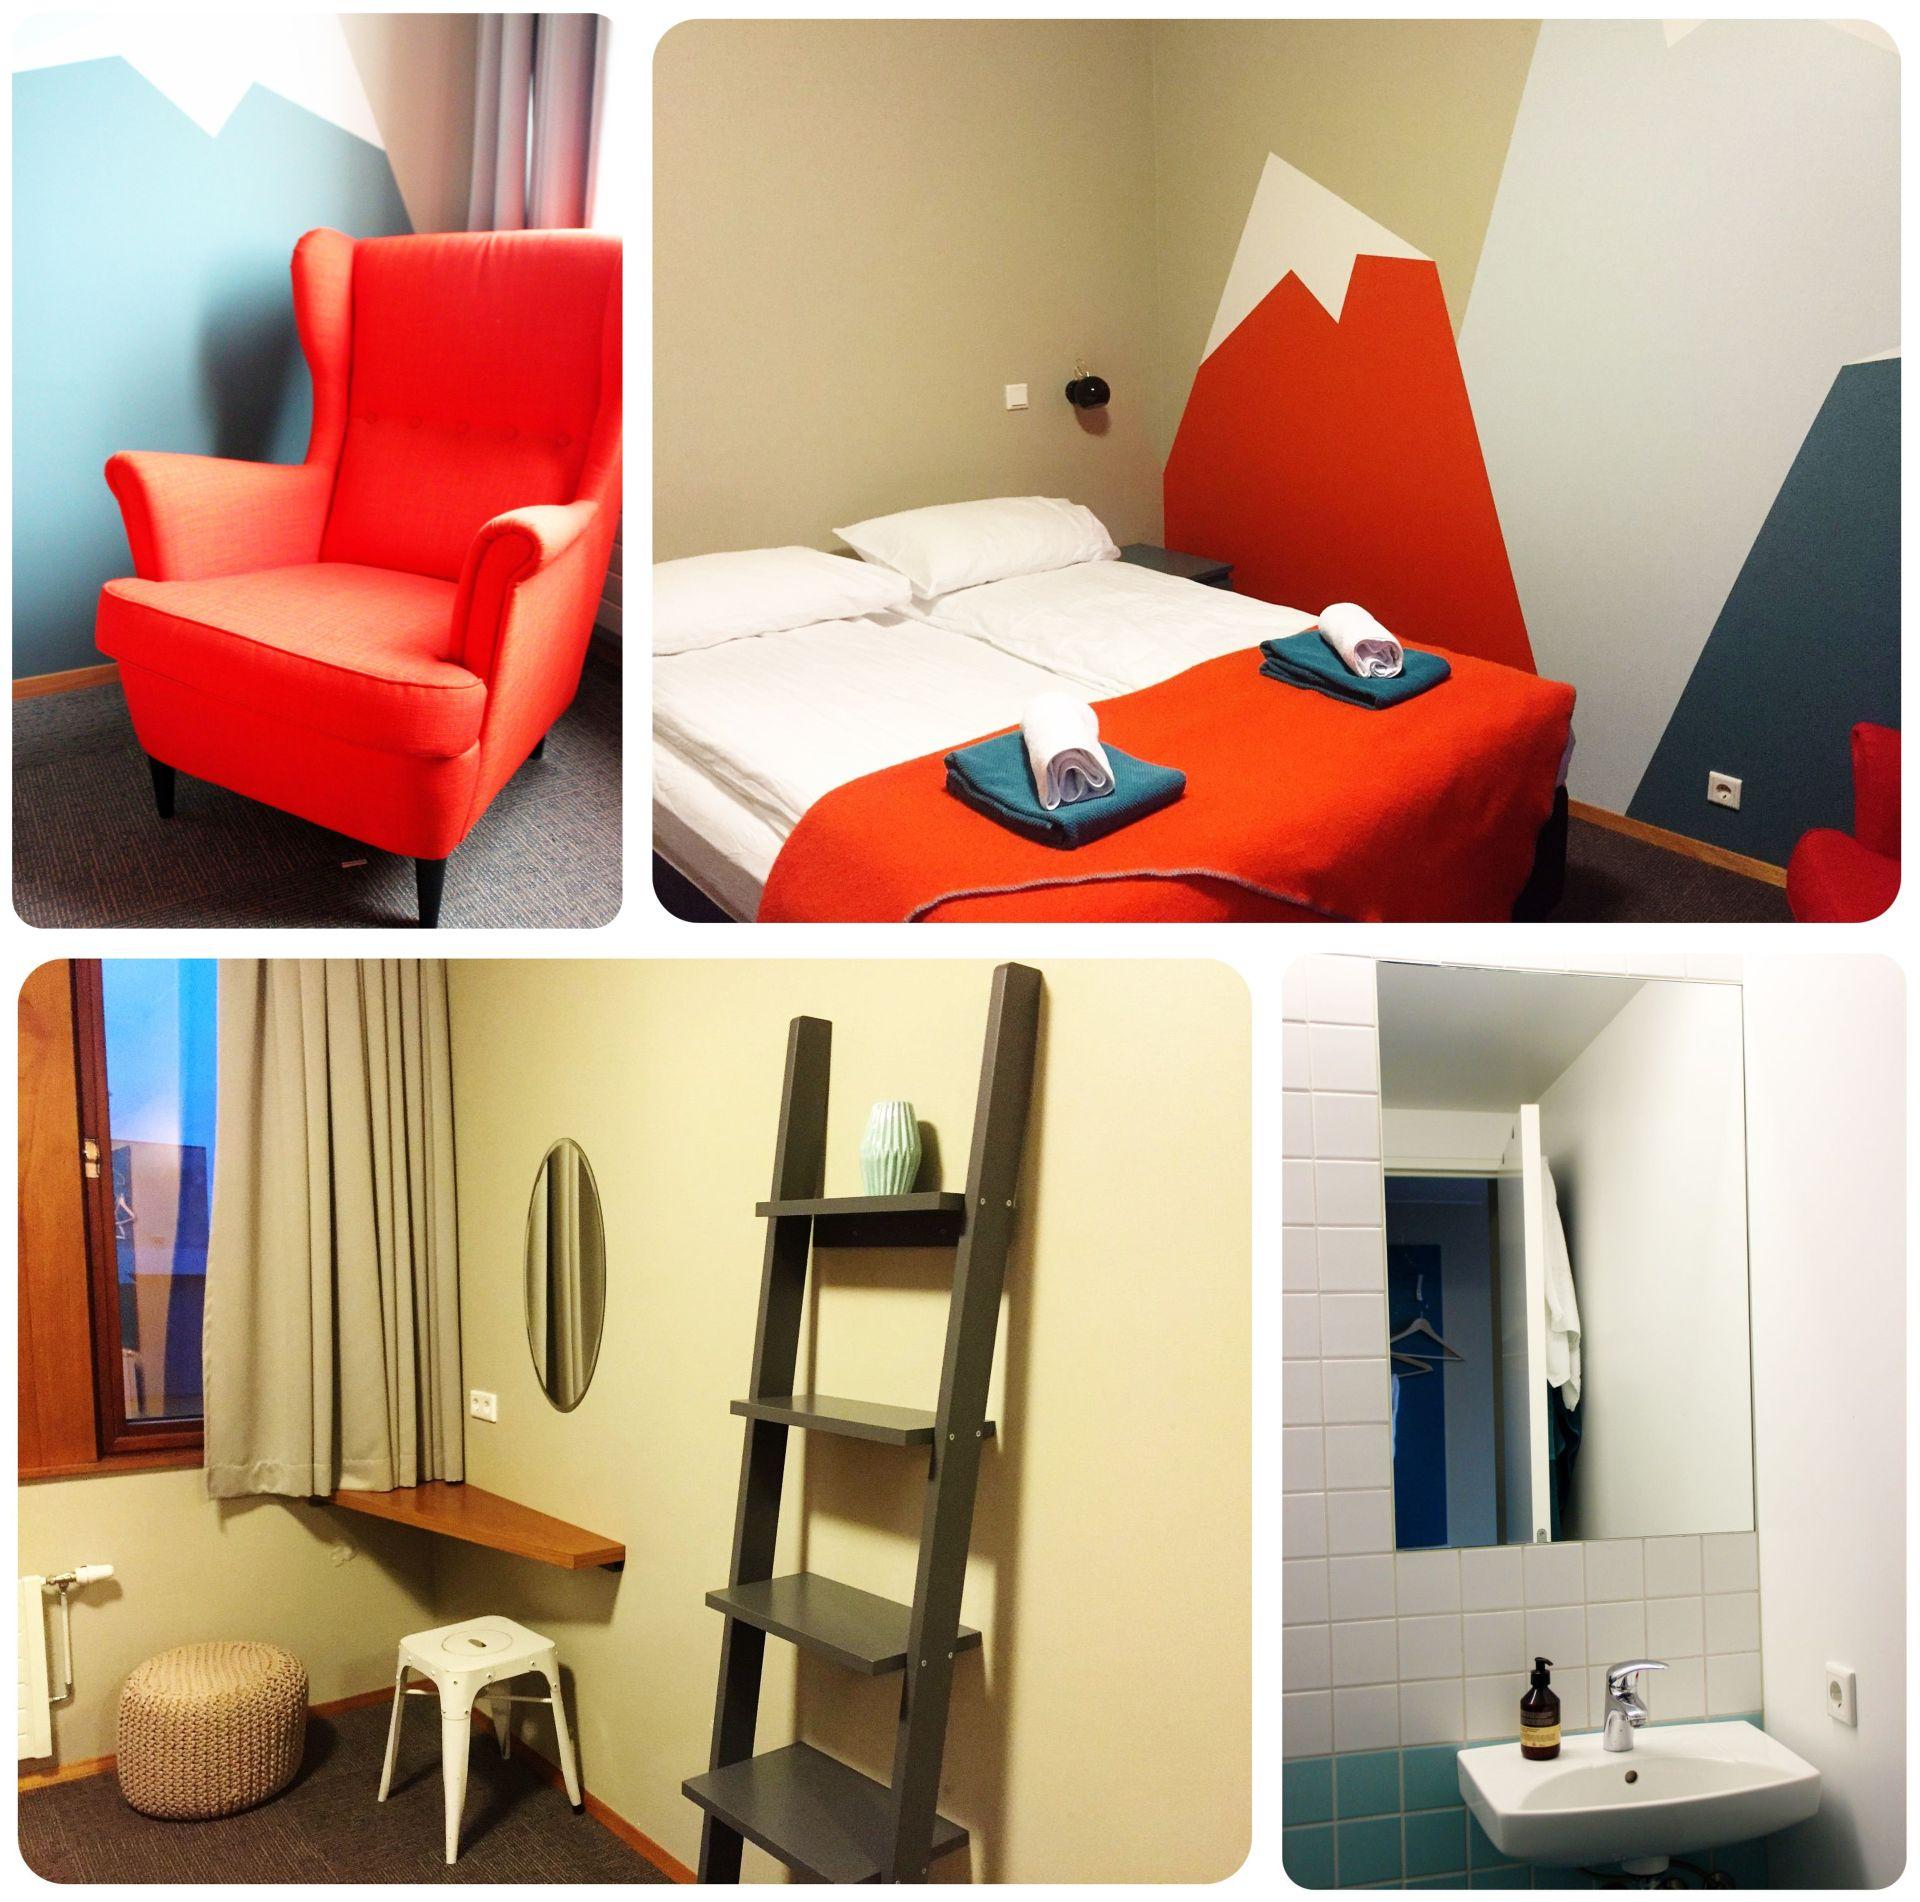 Reykjavik Loft Hostel Room